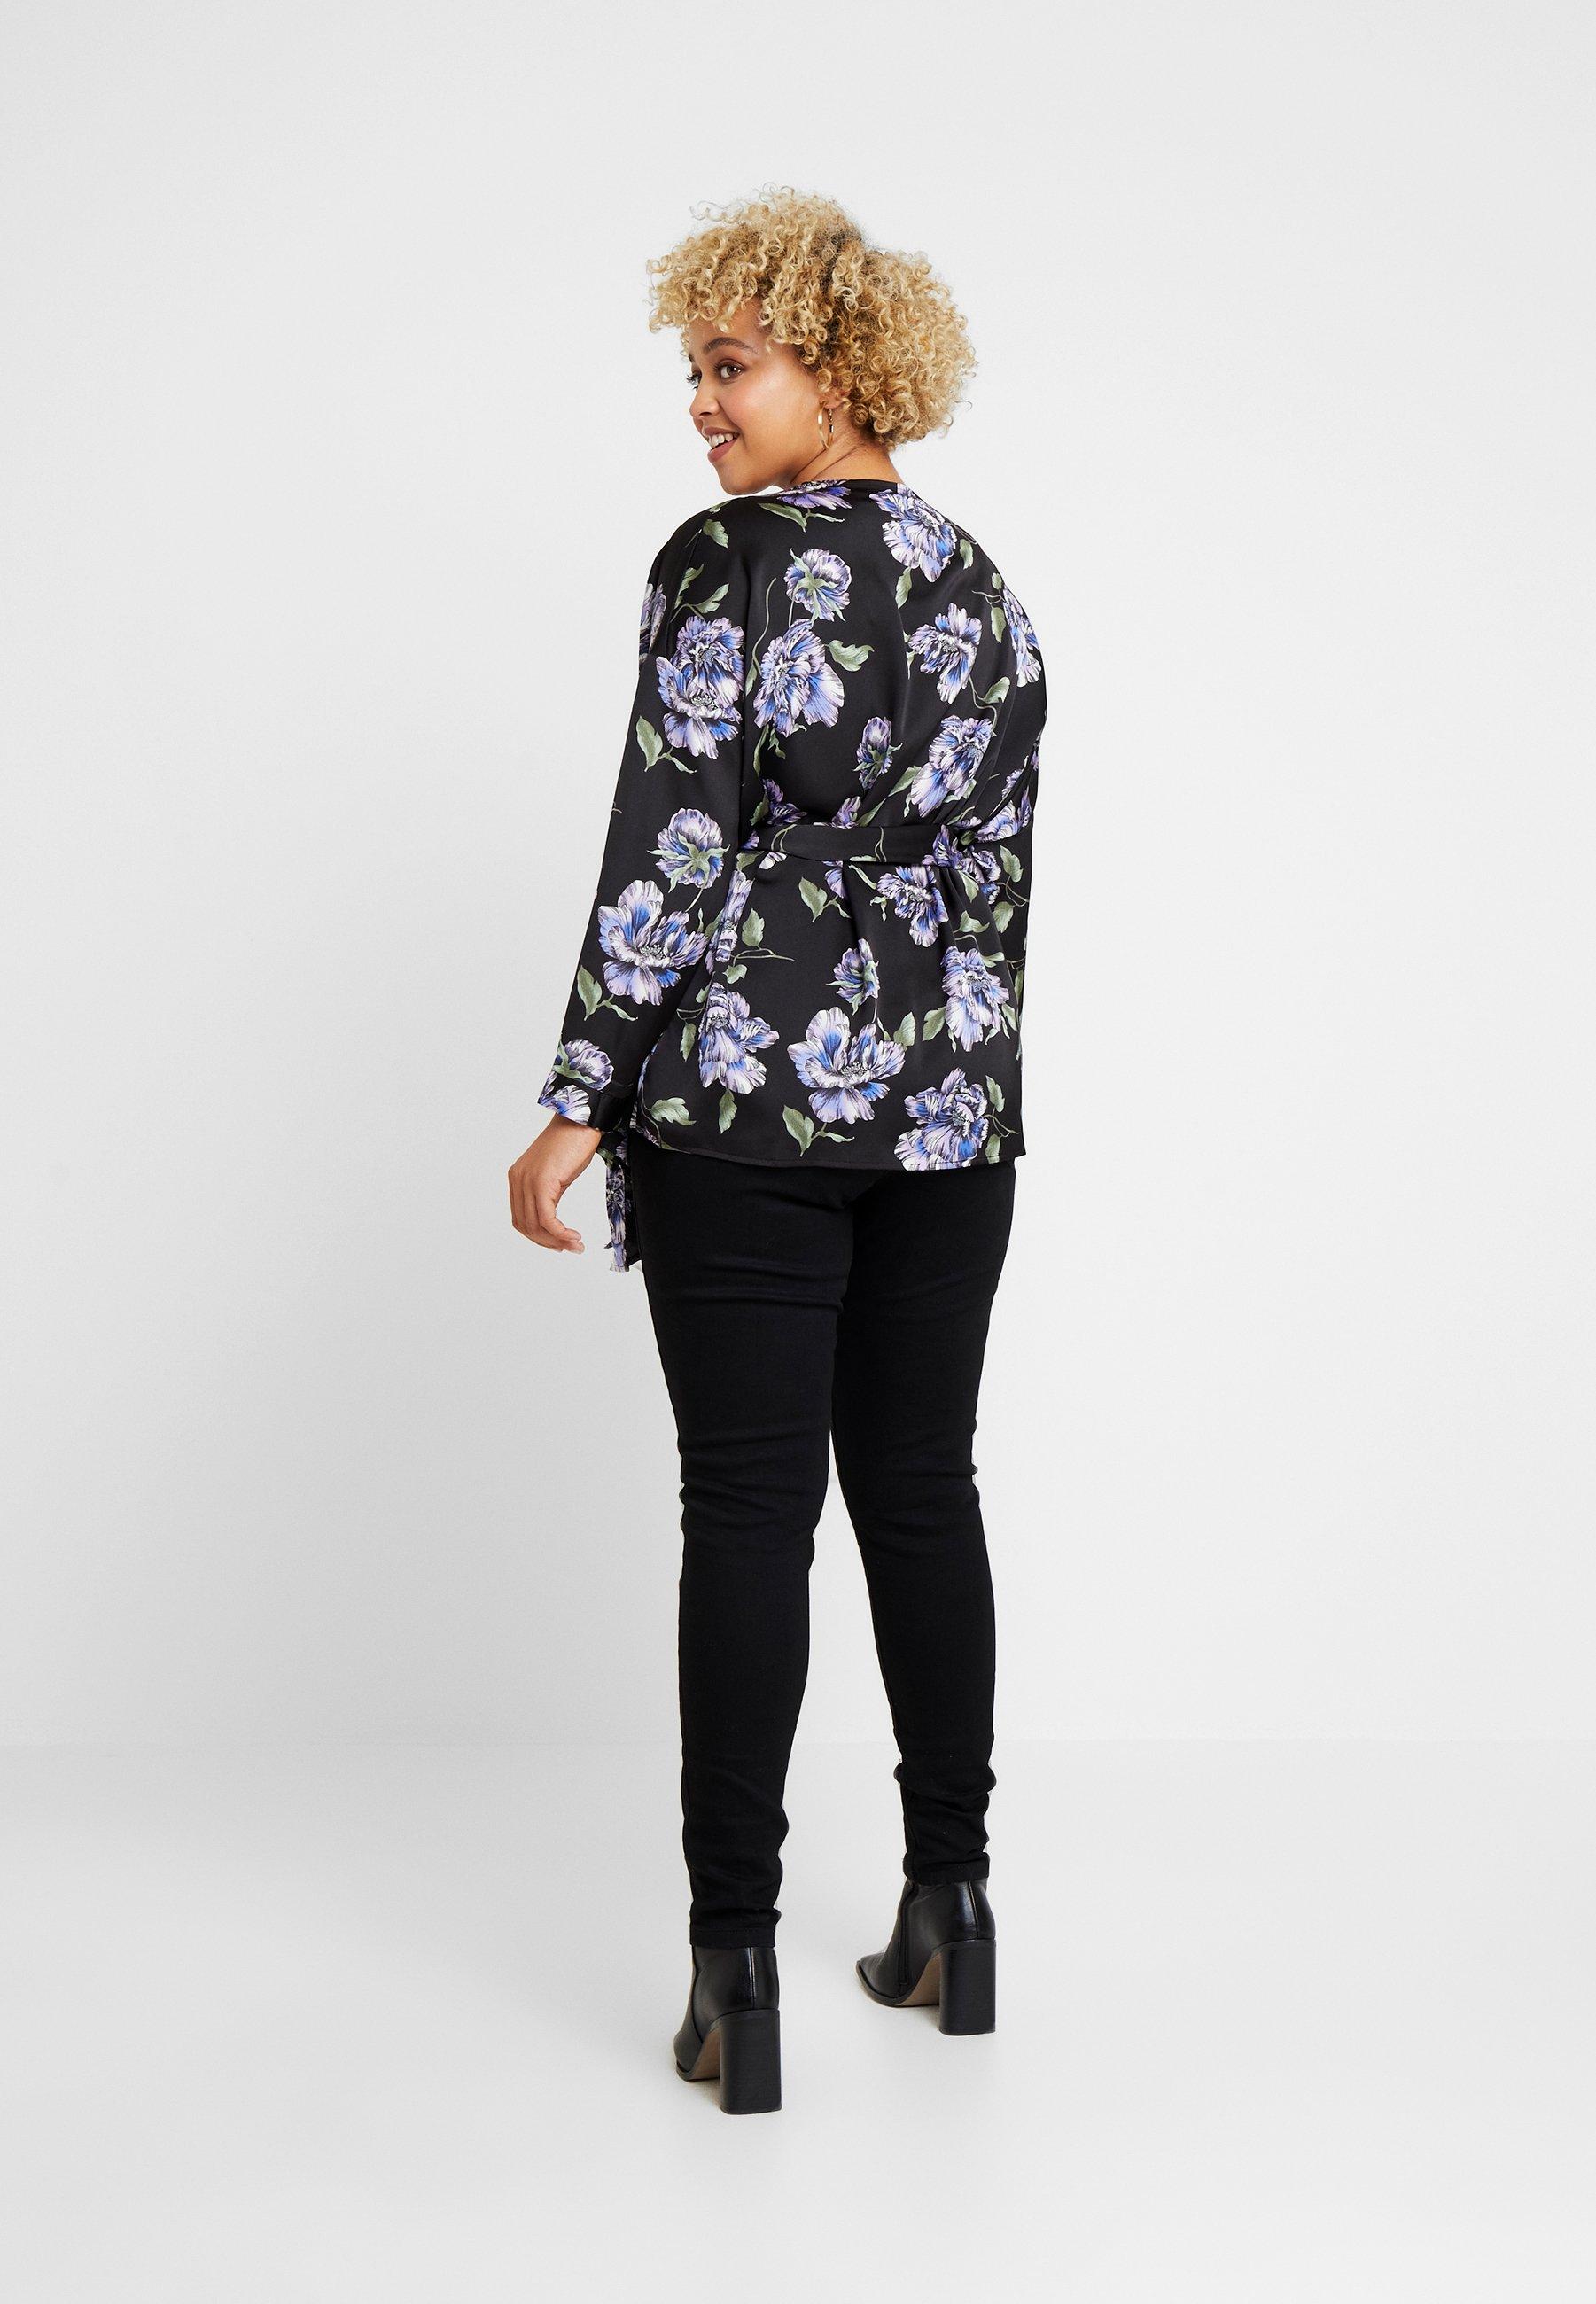 SkinnyBlack Be Jeans By Capsule Simply luK1T5cFJ3